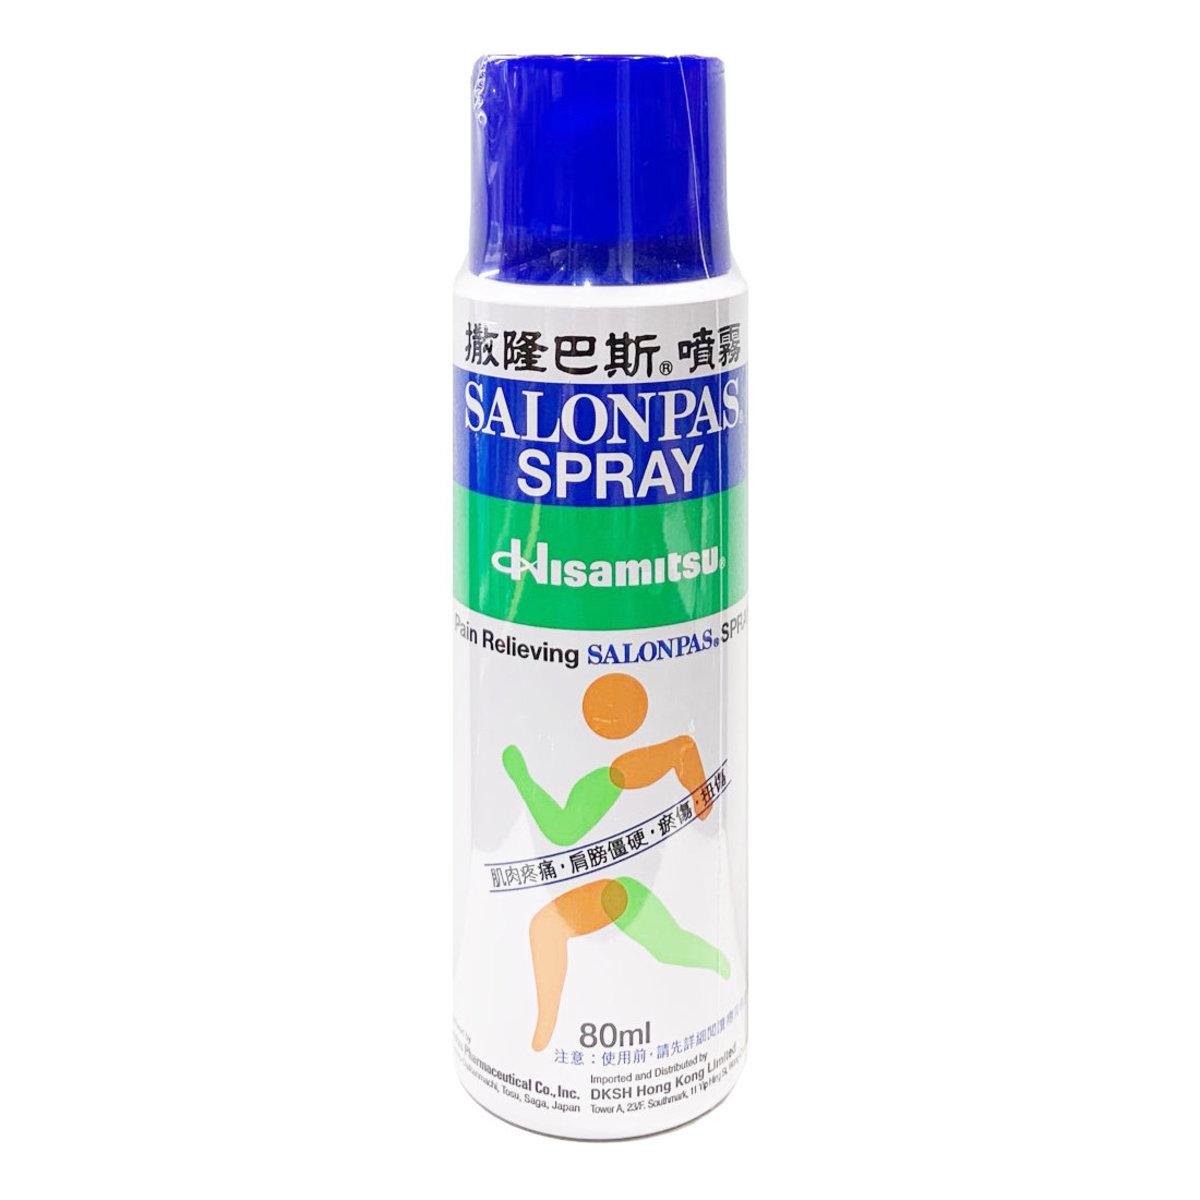 Pain Relieving Spray 80ml (346581400809)